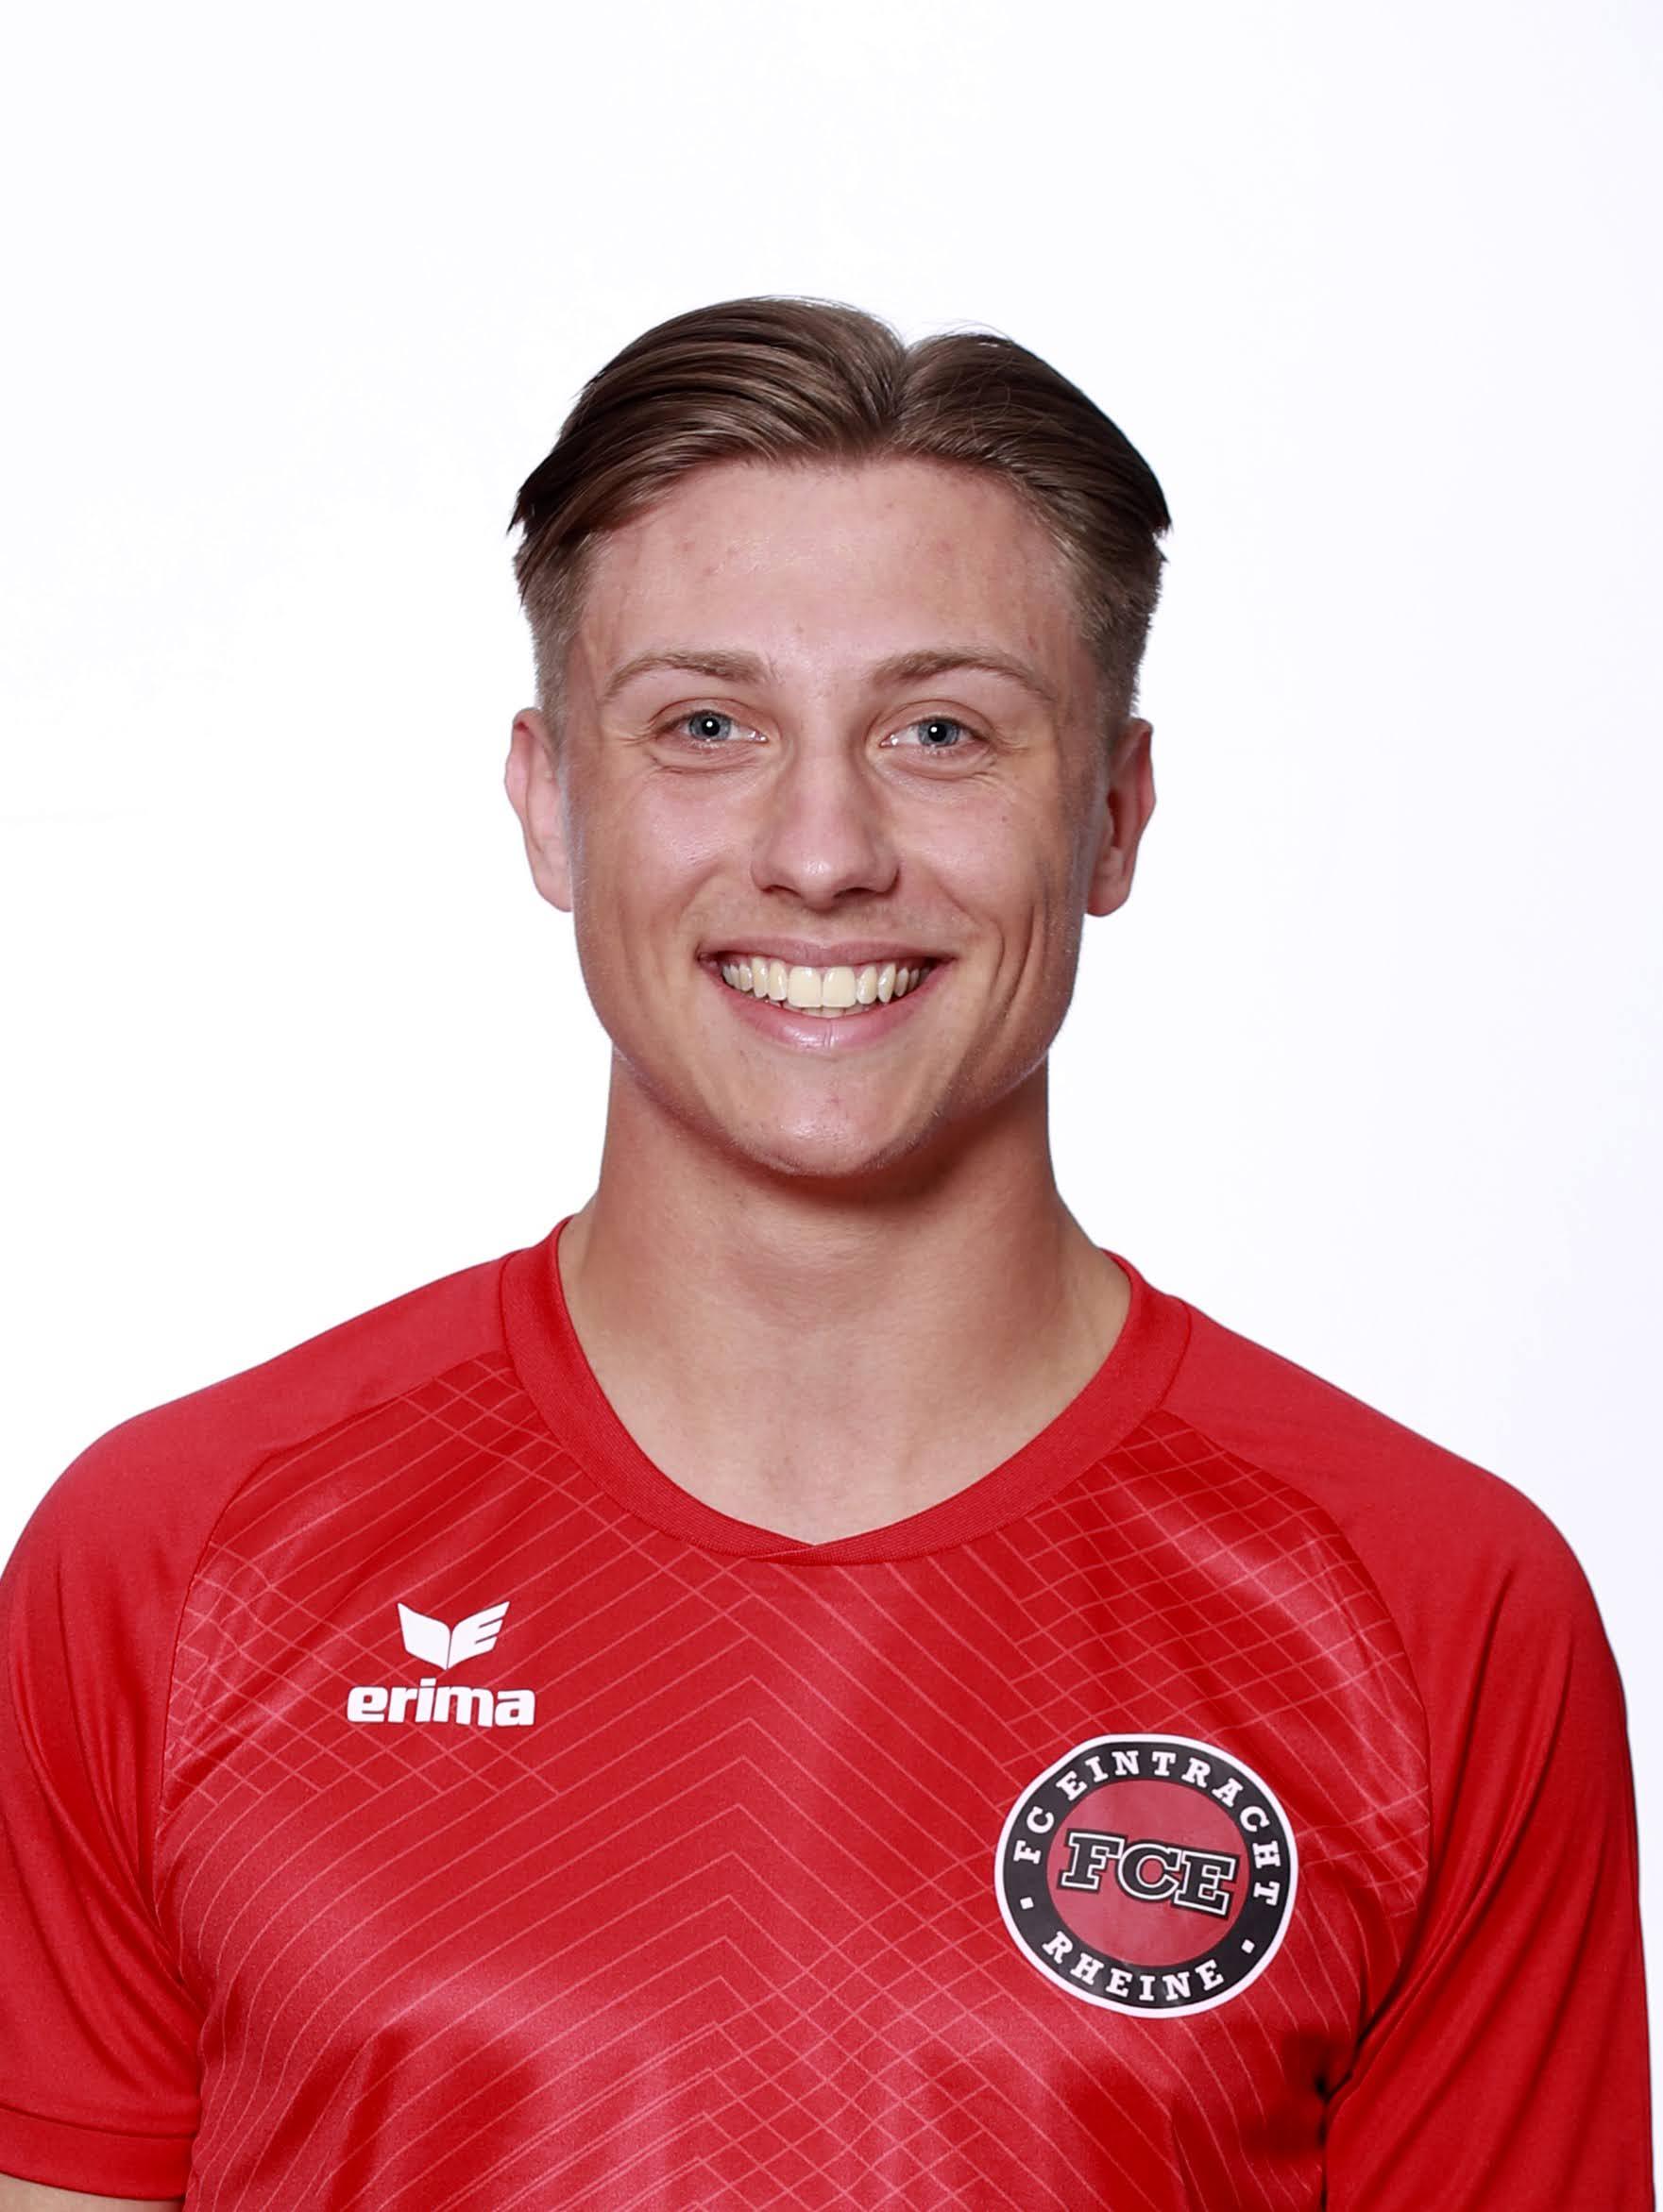 Mick Schüttpelz